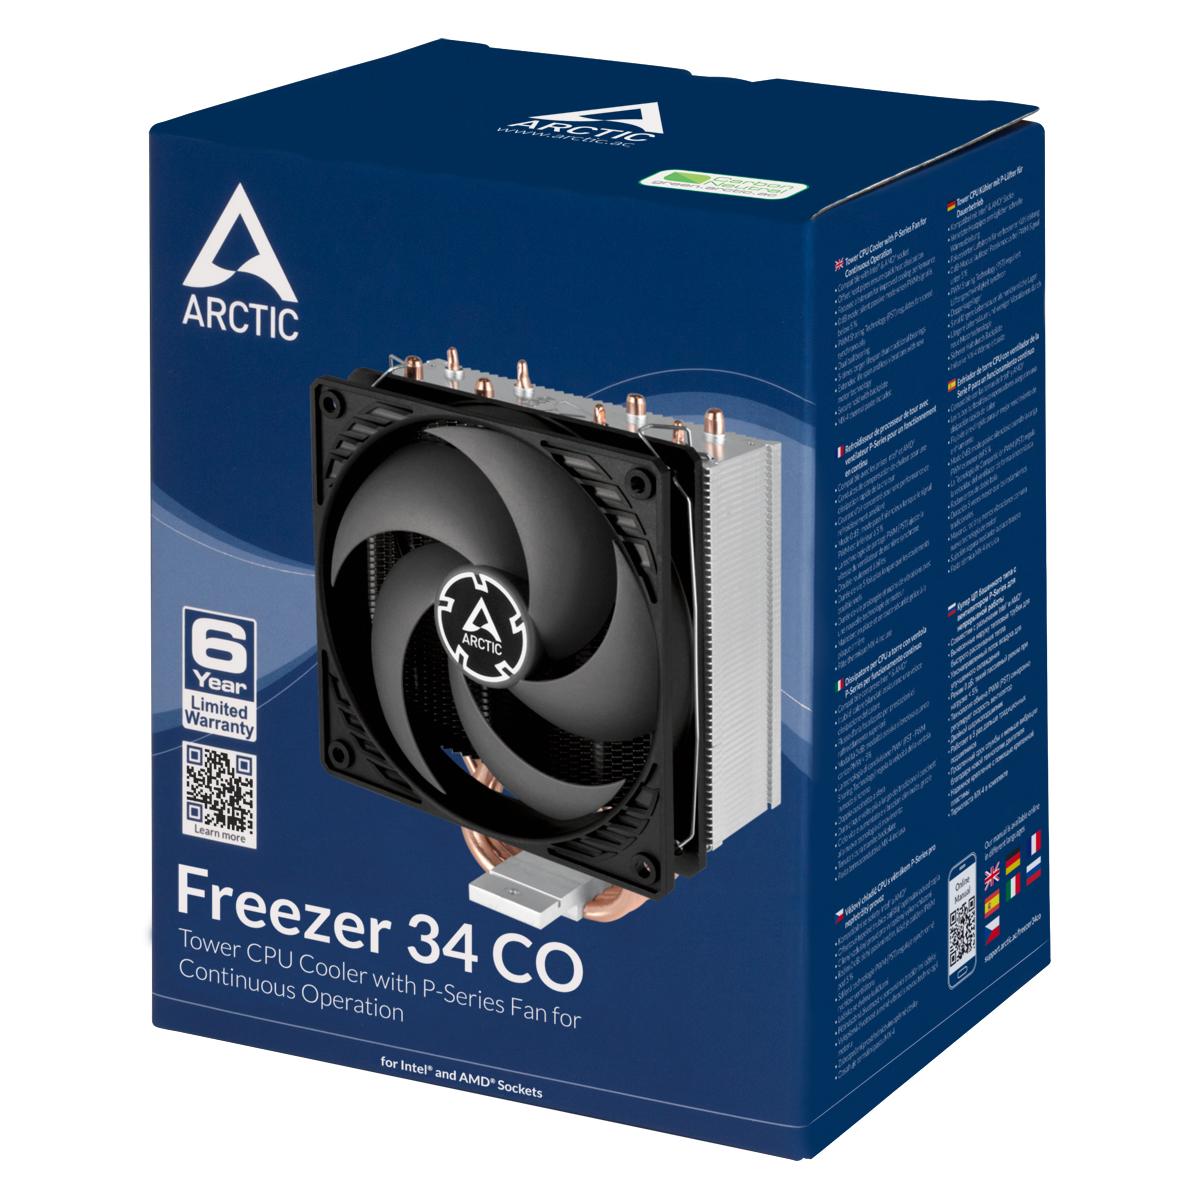 Freezer 34 CO